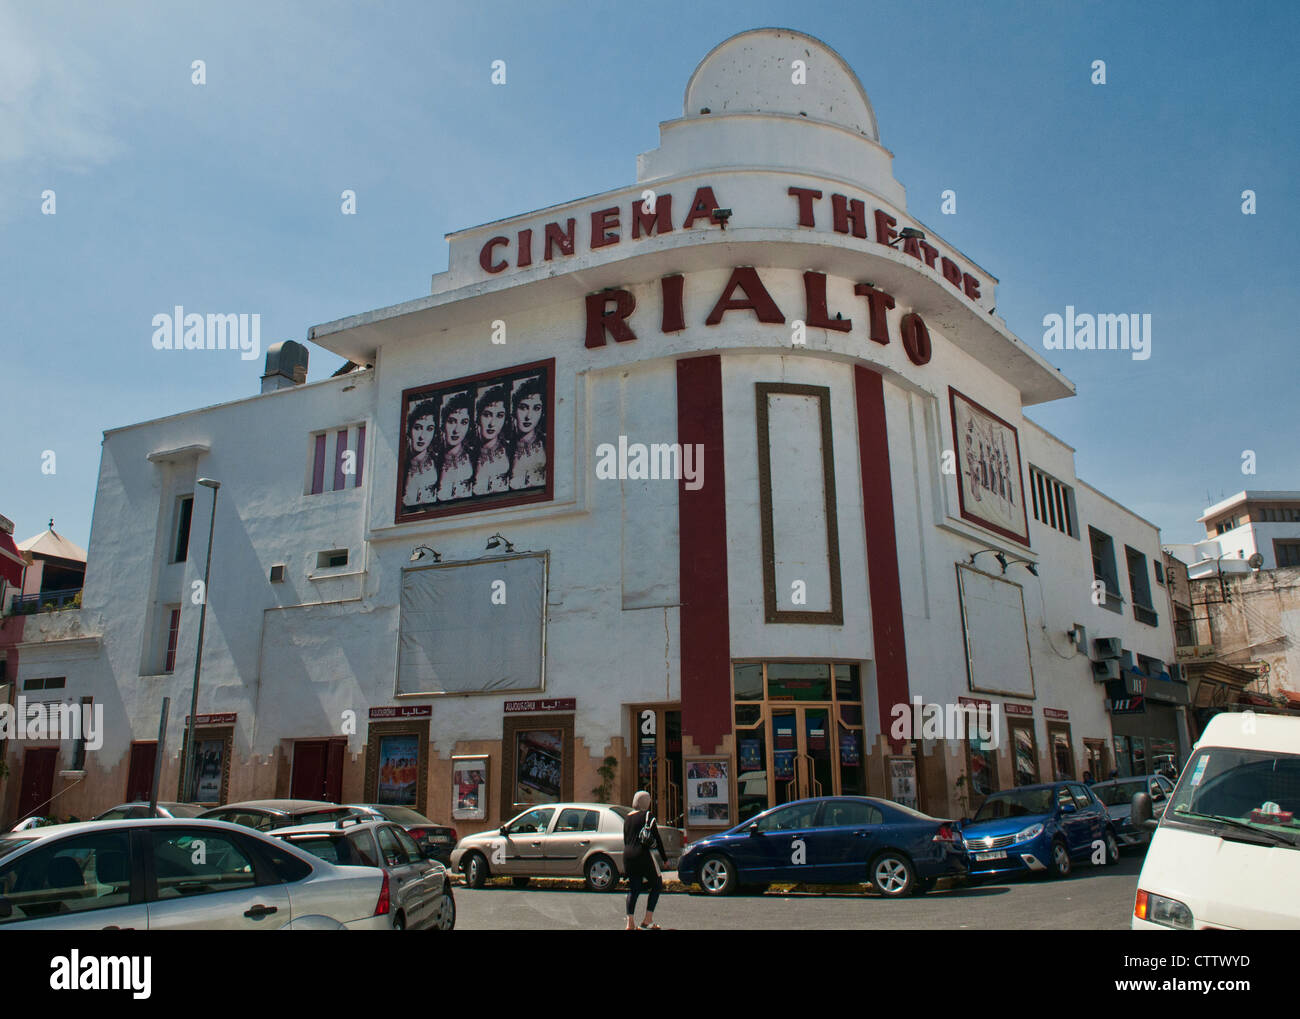 Deco Architektur rialto kino klassische deco architektur in casablanca marokko